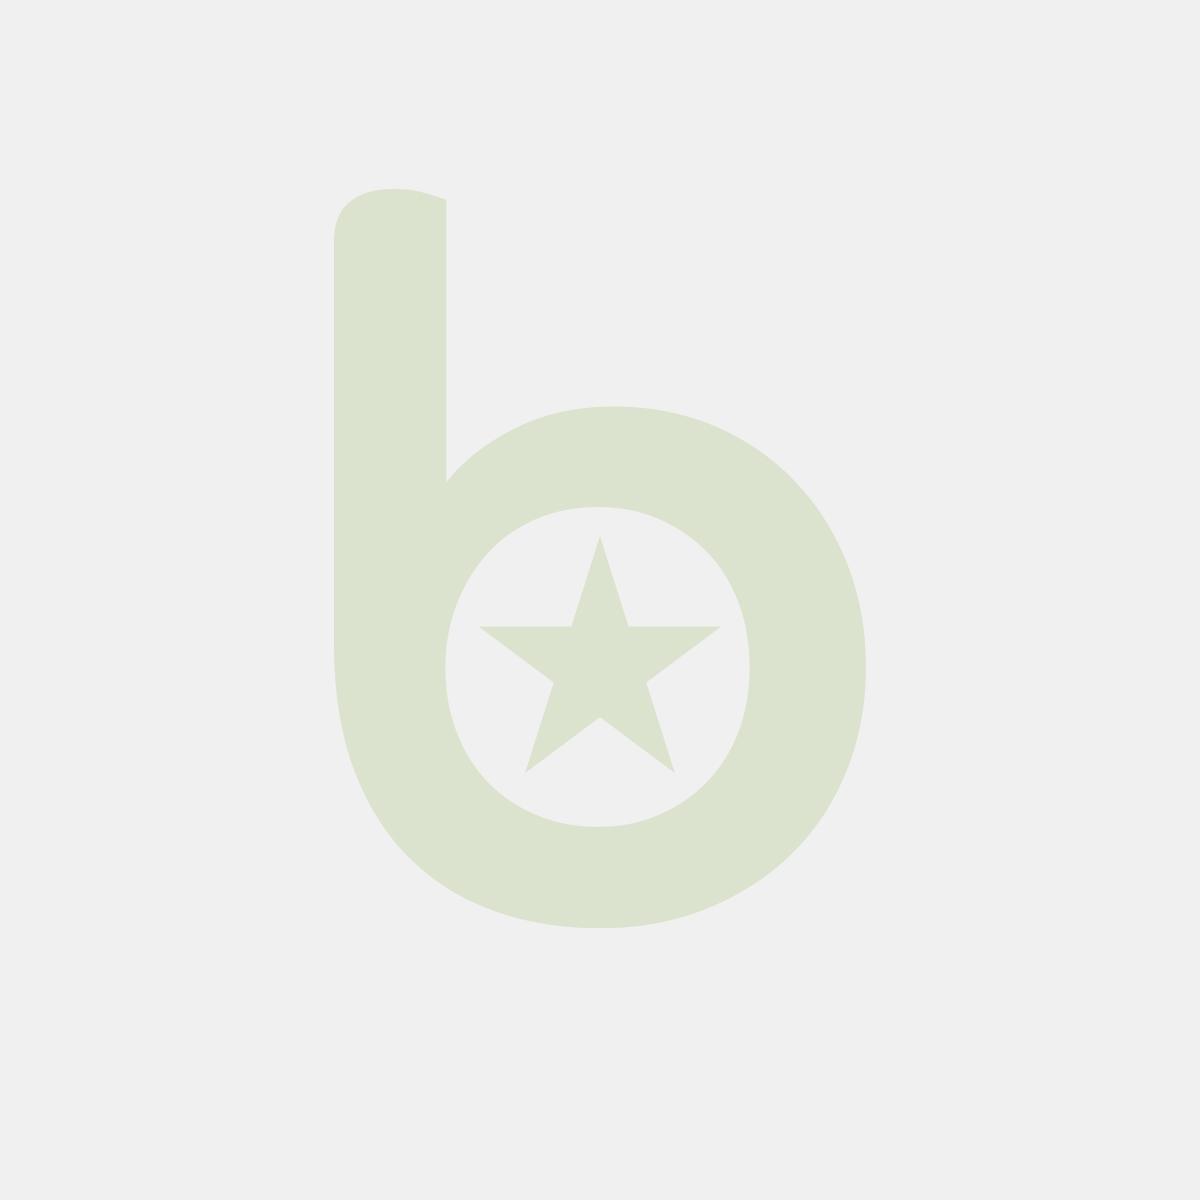 Zakaz palenia tytoniu B2 - 105 x 105mm GP002B2PN